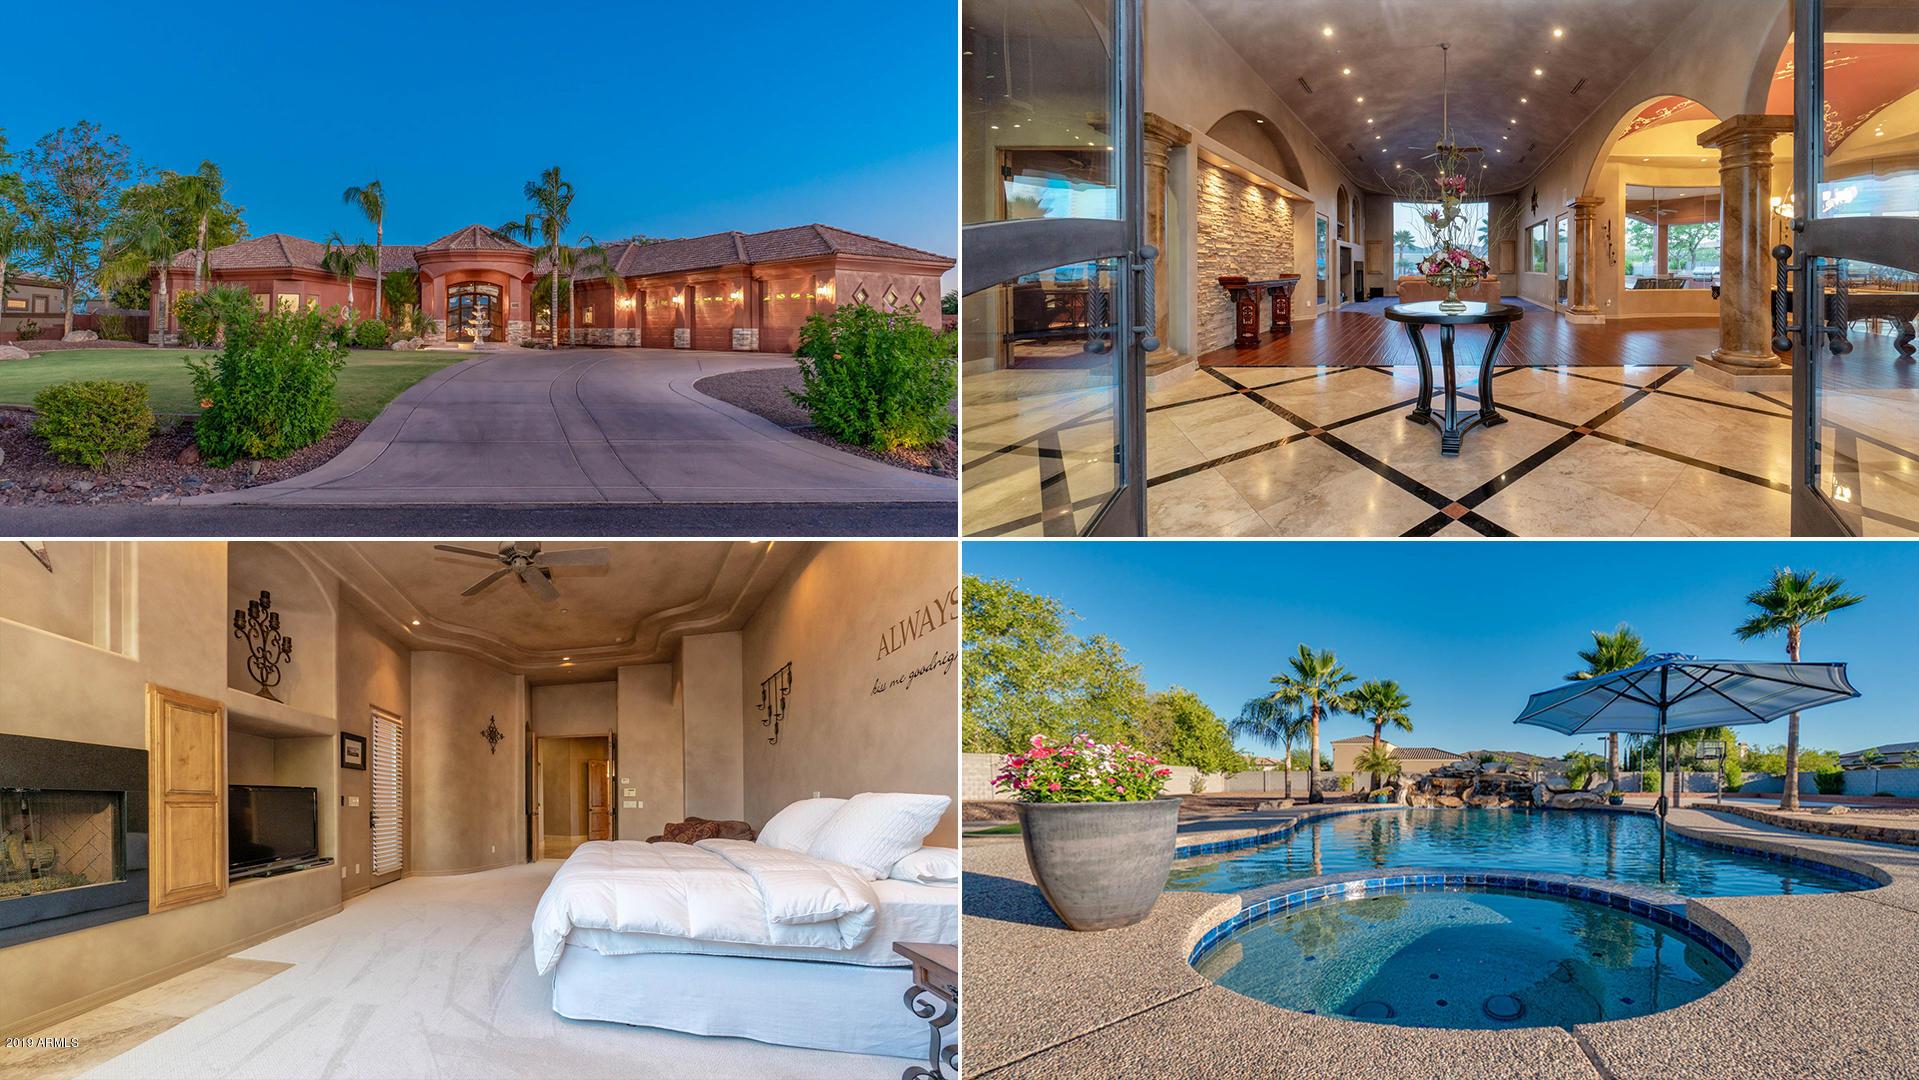 MLS 5821102 4721 W CREEDANCE Boulevard, Glendale, AZ 85310 Glendale AZ Luxury